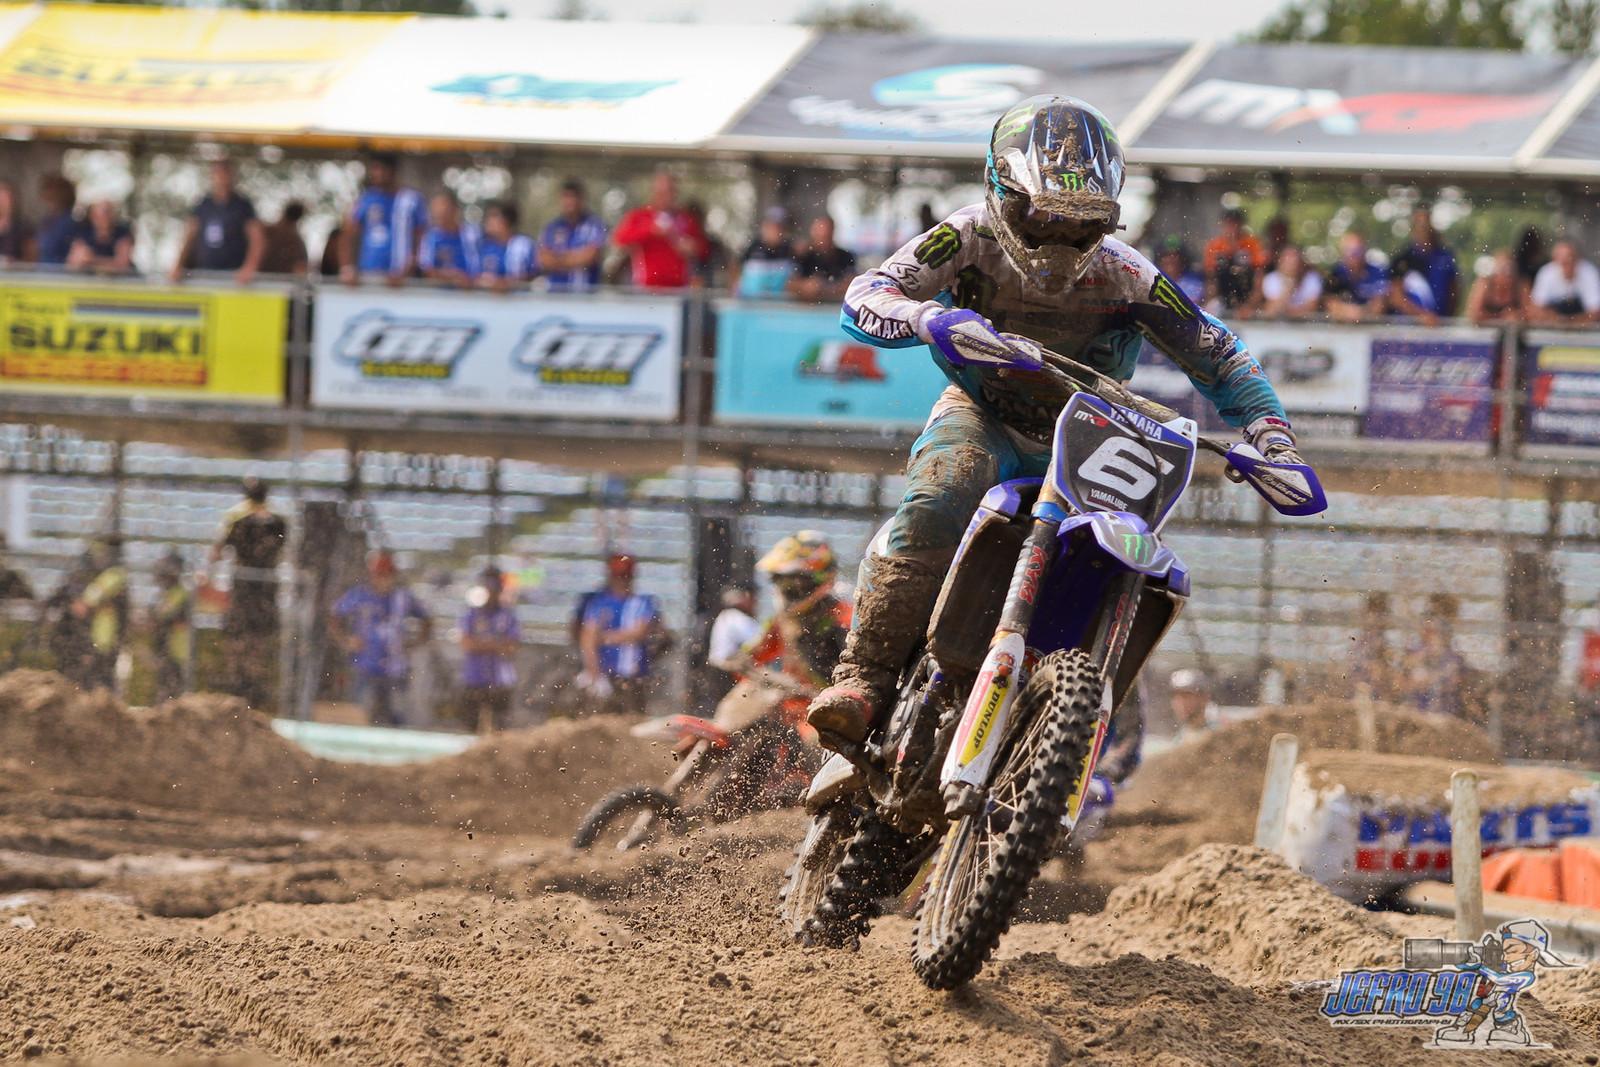 Benoit Paturel - Photo Gallery: MXGP of the Netherlands - Motocross Pictures - Vital MX